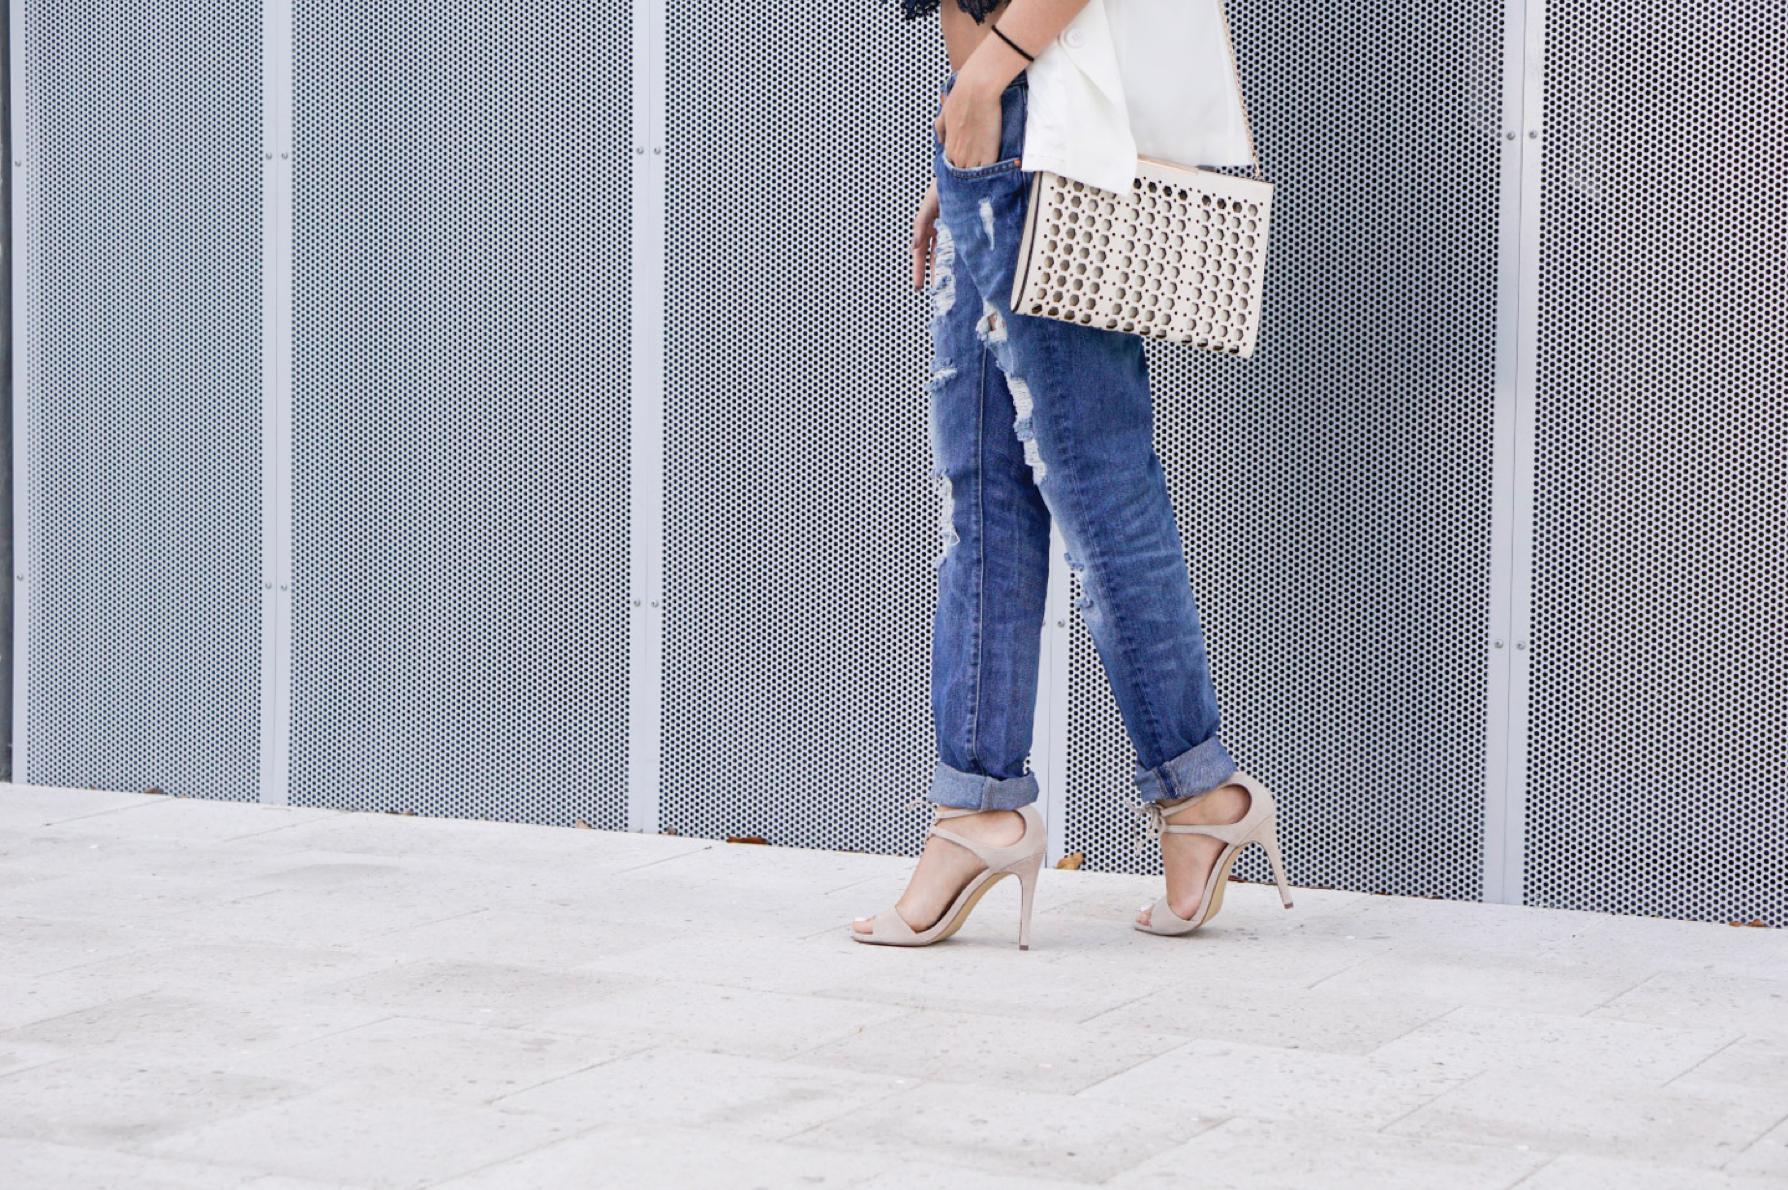 fashion-business-miami-photographer-illy-perez6.png